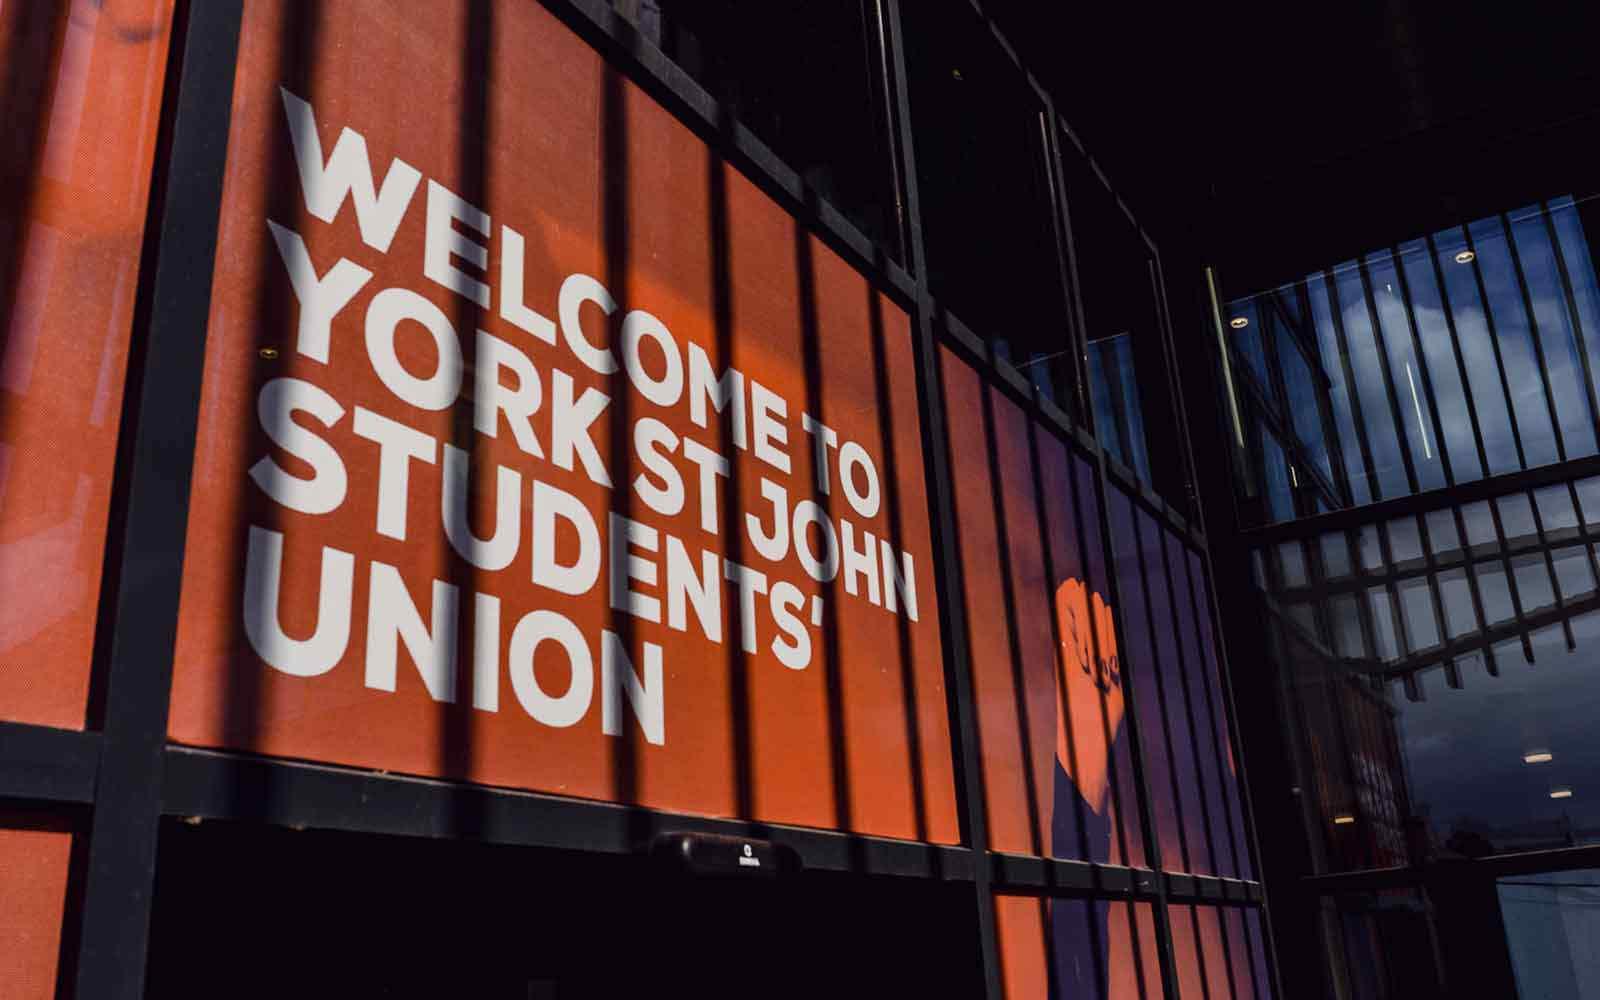 Students Union exterior